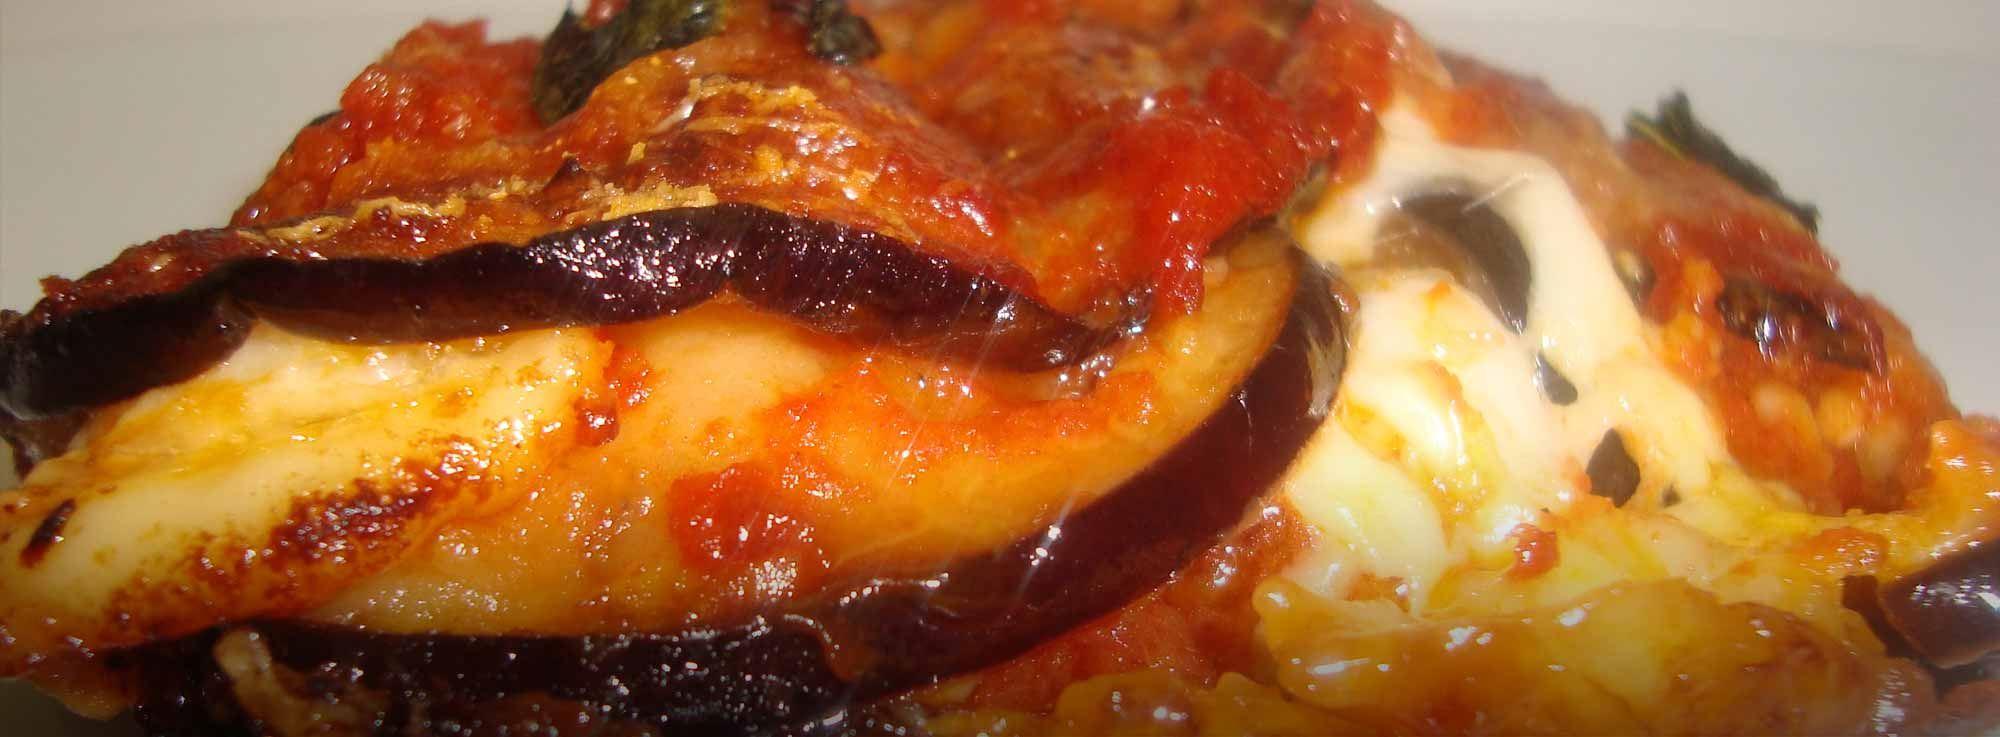 Ricetta: Parmigiana di melanzane